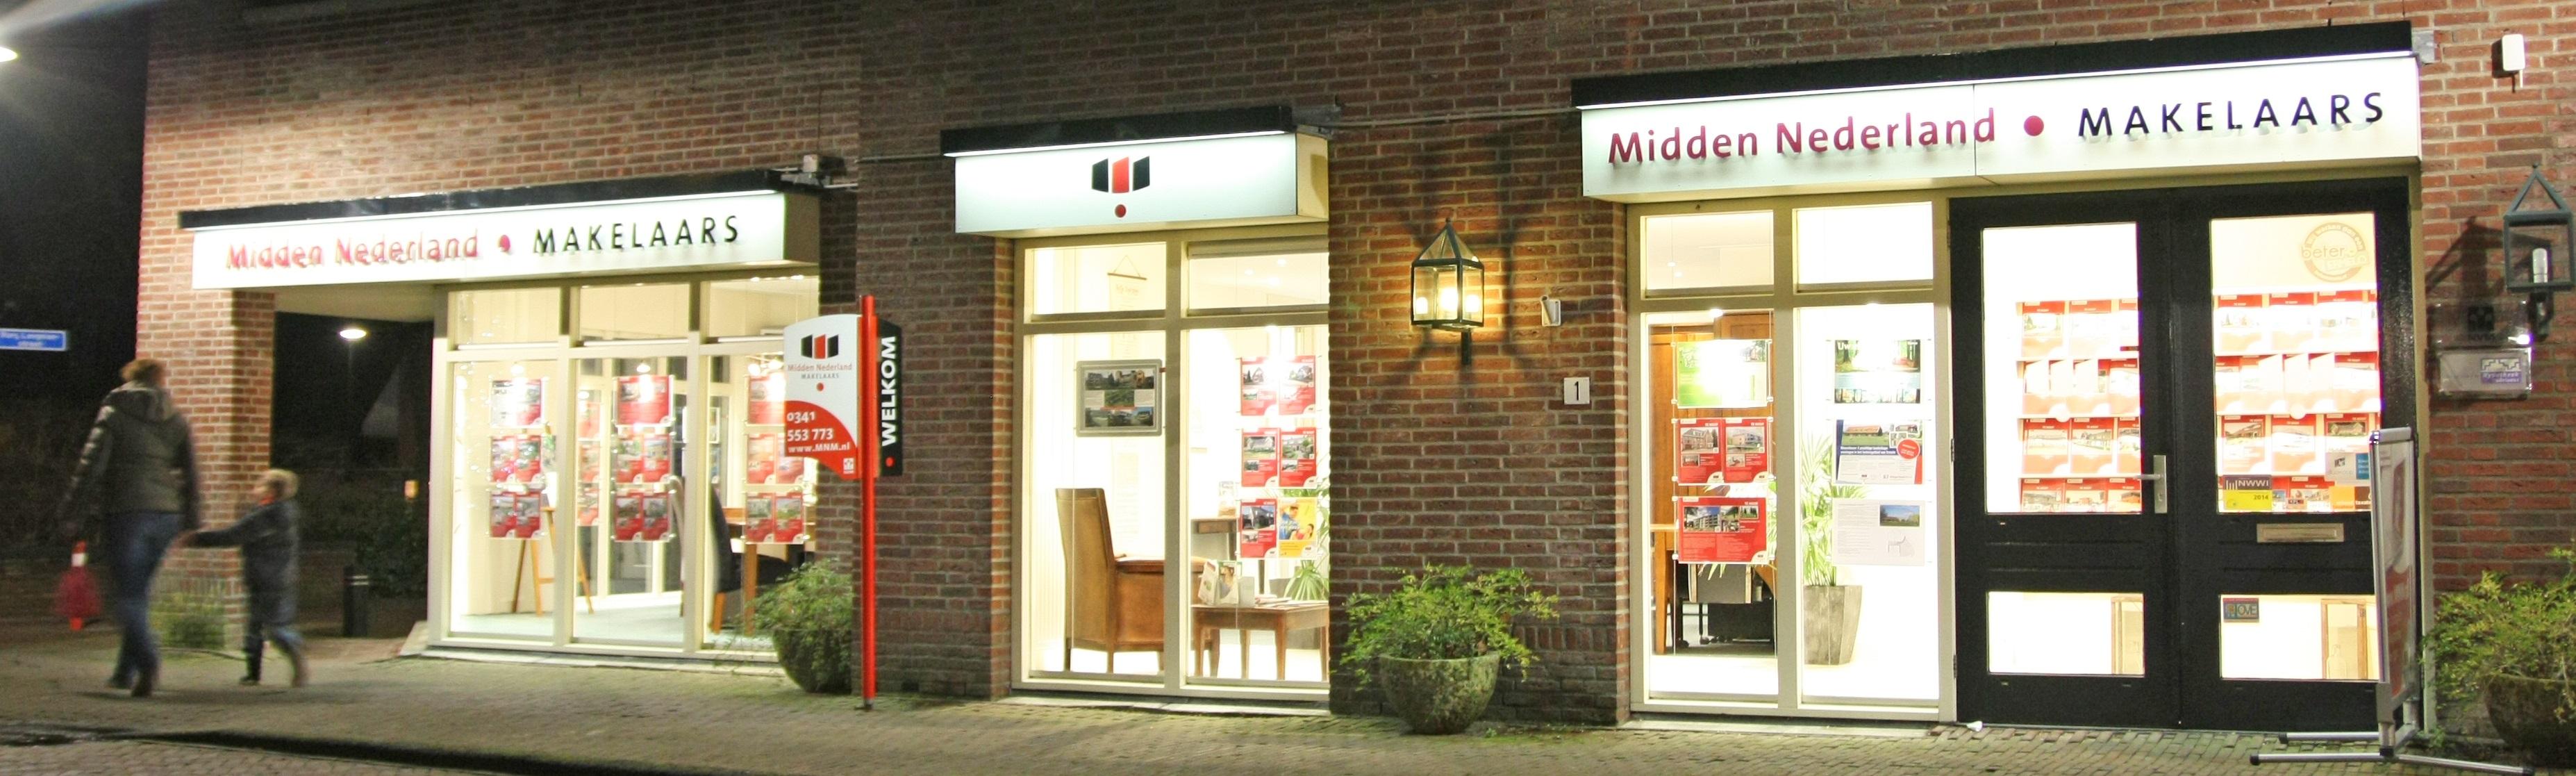 afb-header-midden-nederland-makelaars